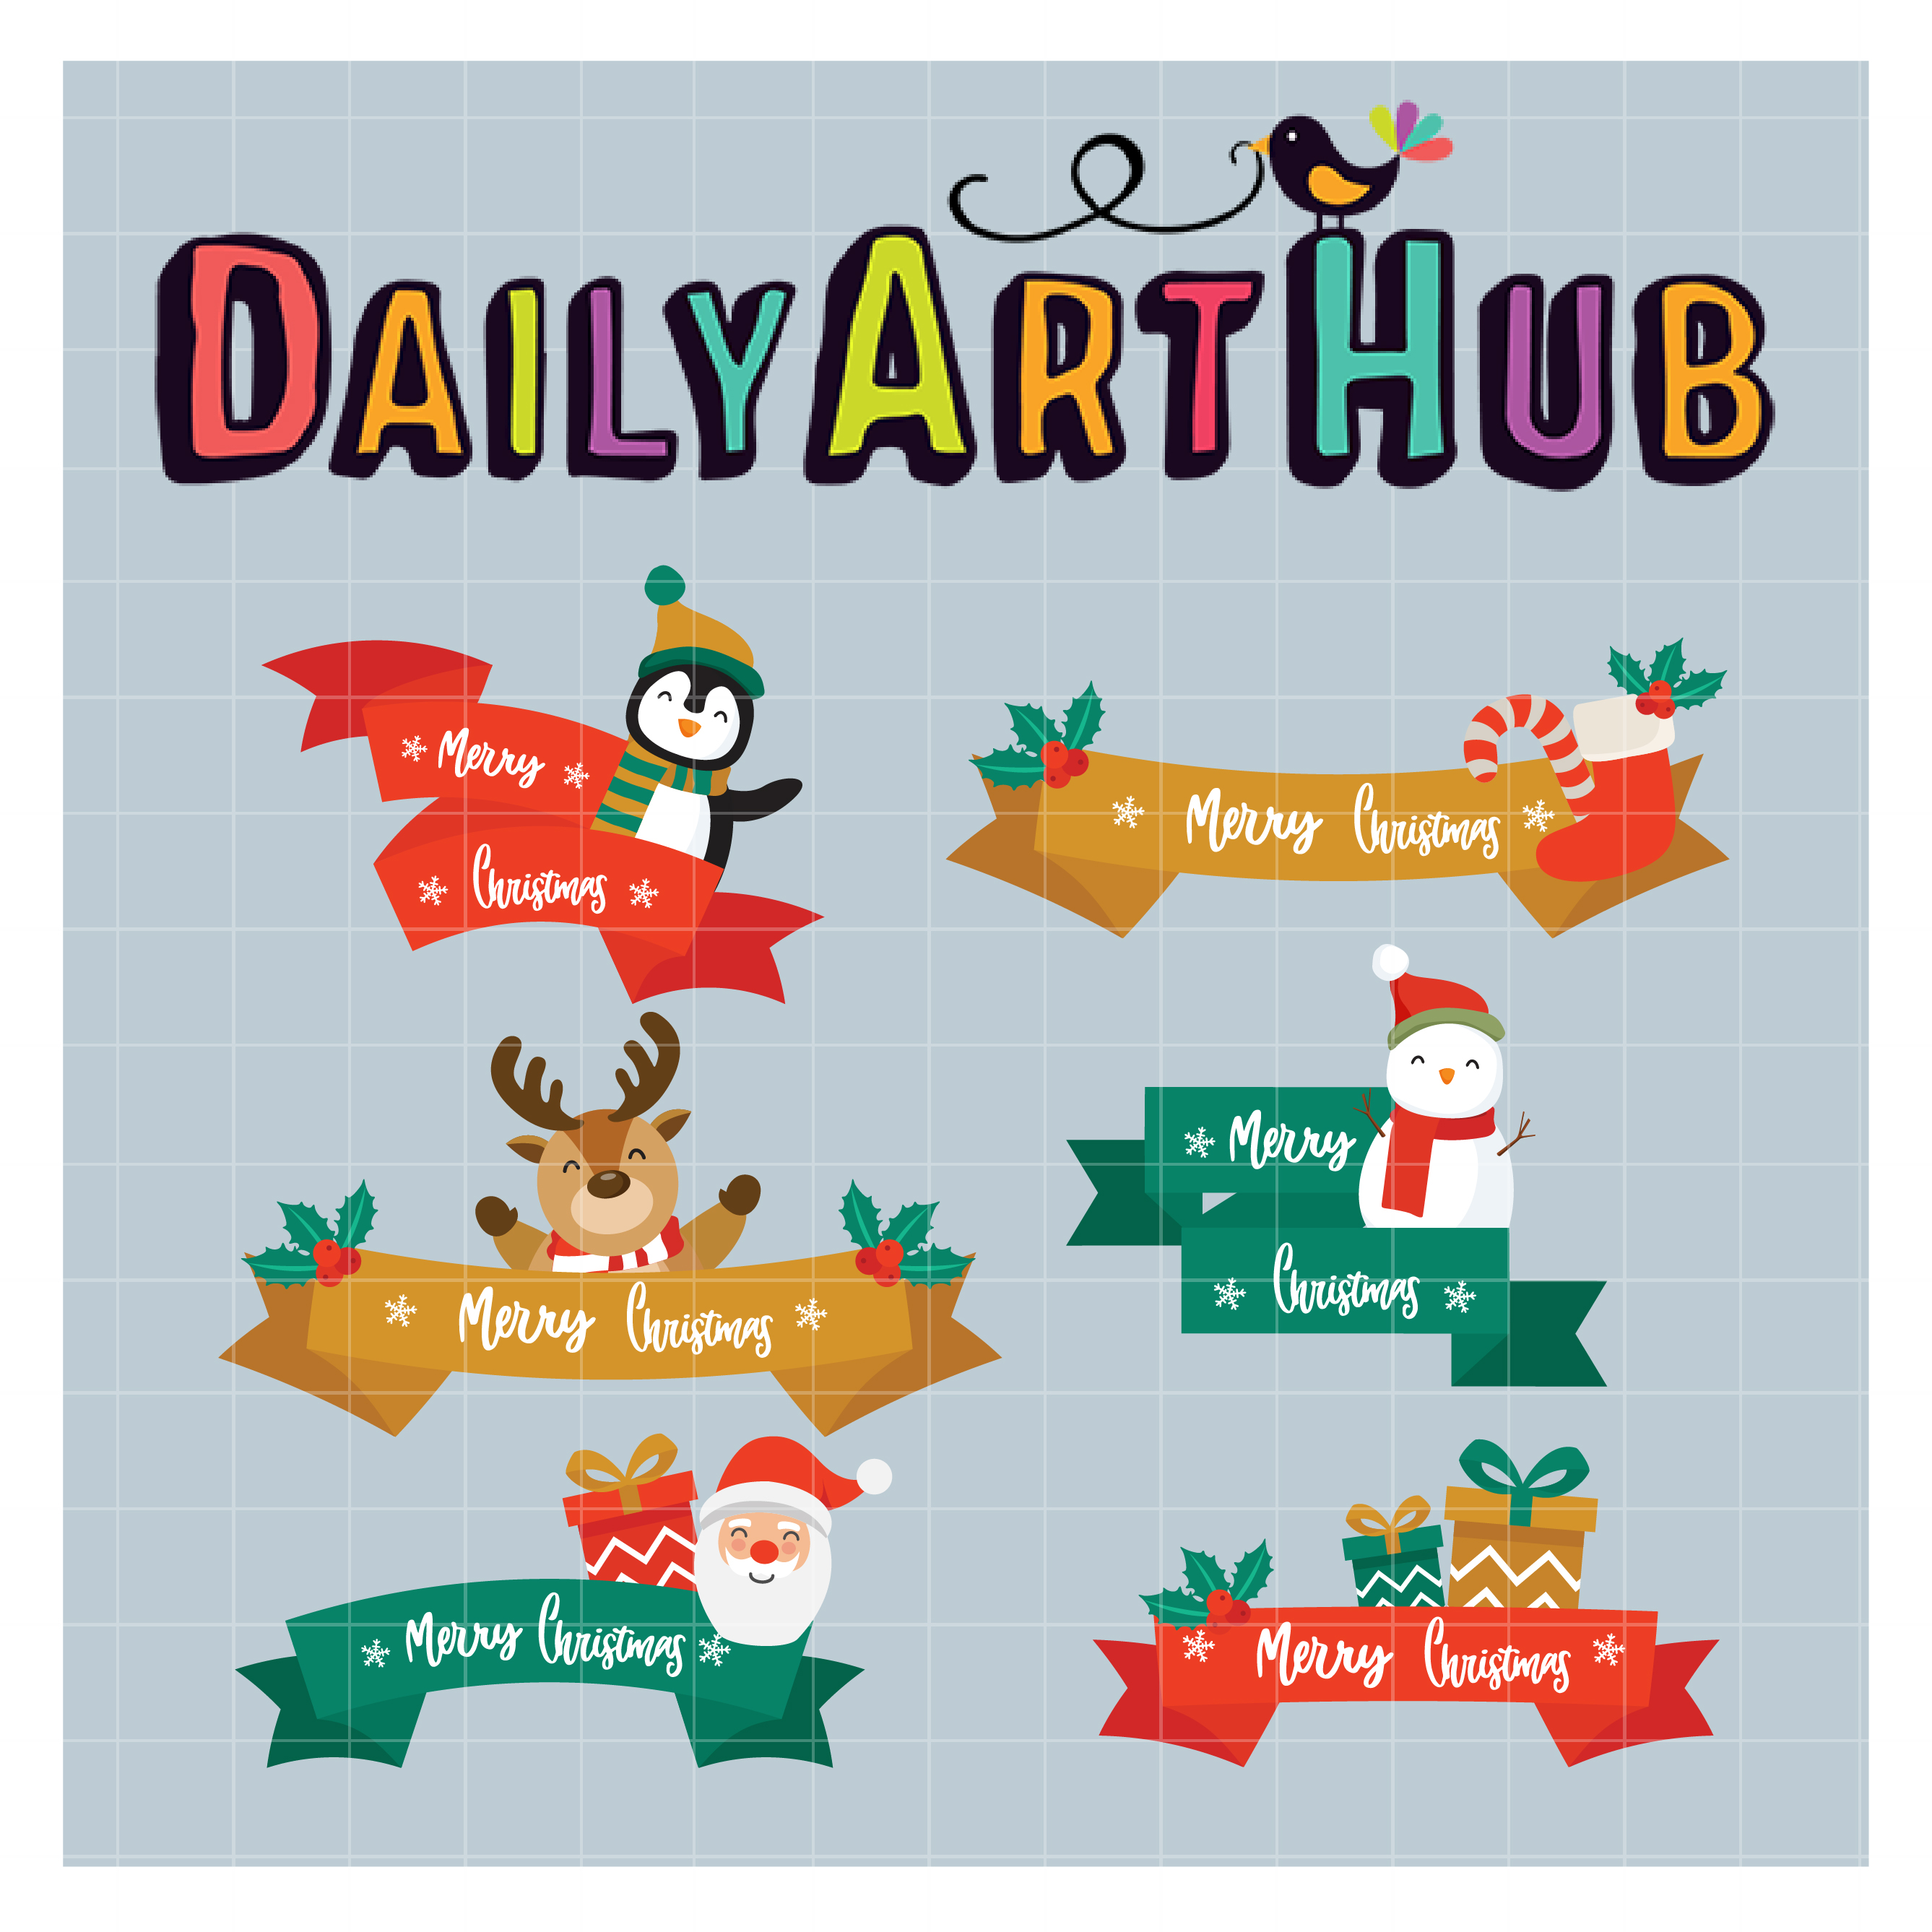 Merry Christmas Ribbon Clipart.Christmas Ribbons Clip Art Set